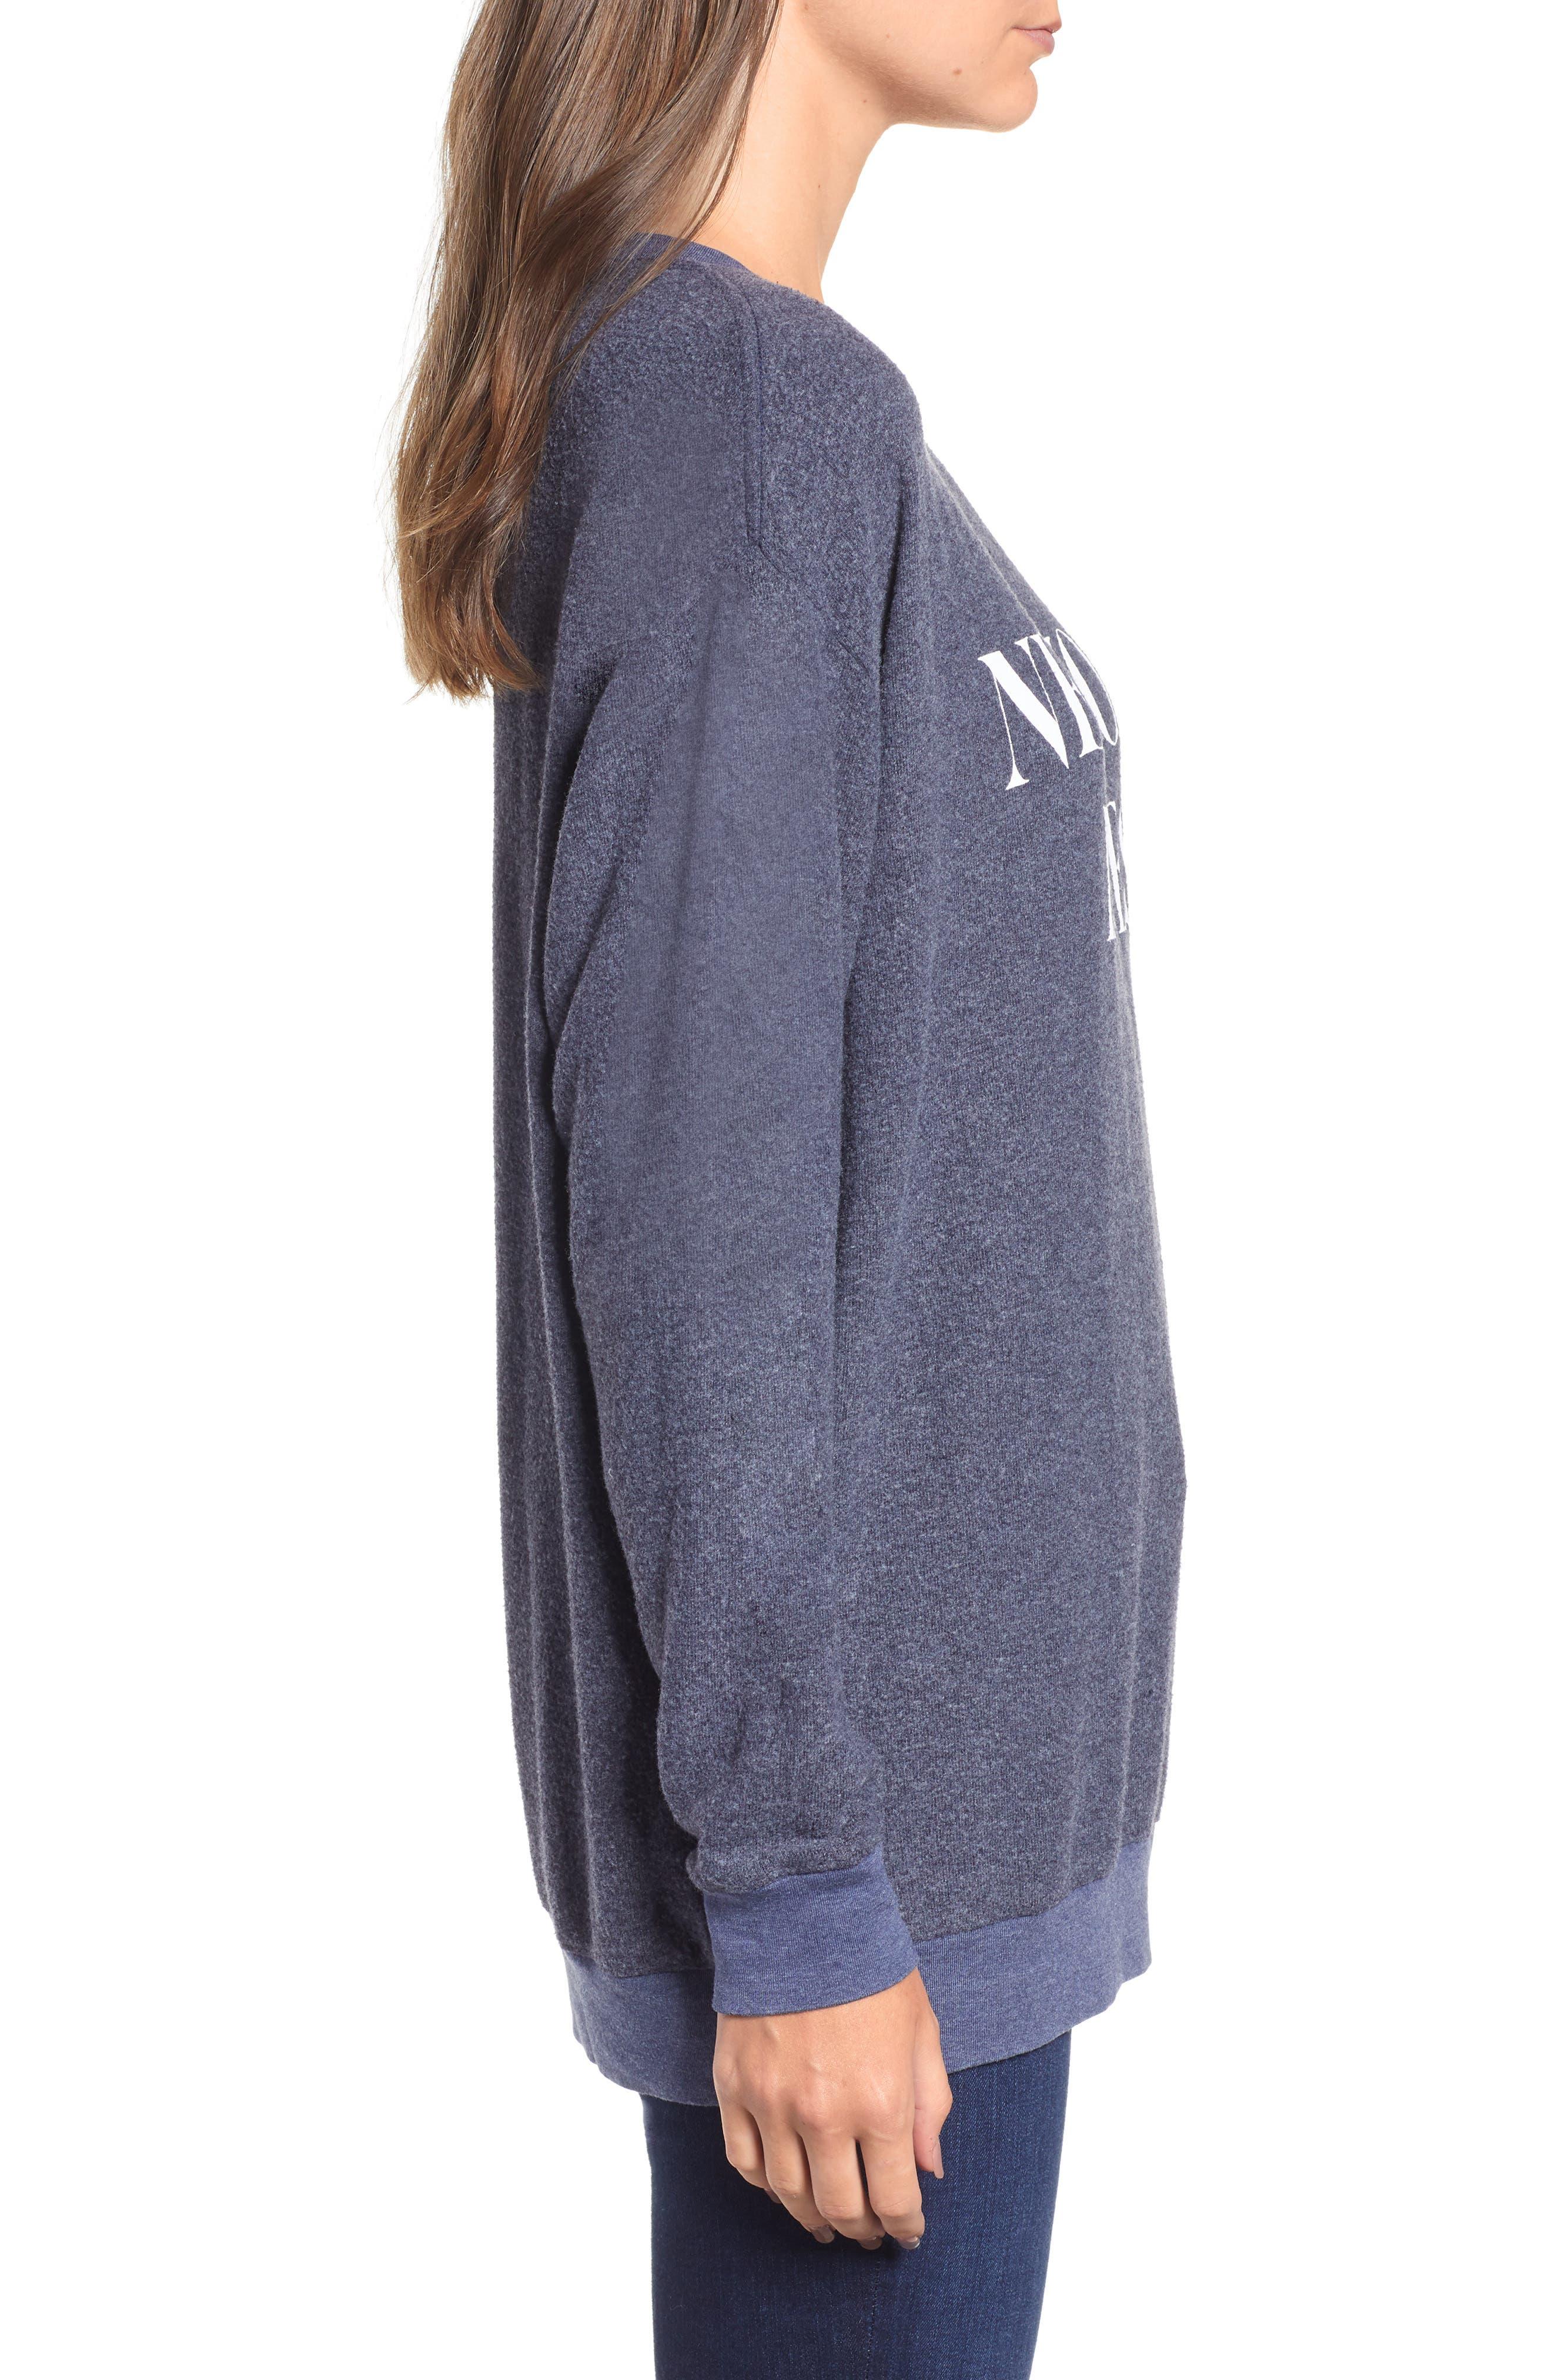 Roadtrip - New York's Finest Pullover,                             Alternate thumbnail 3, color,                             OXFORD